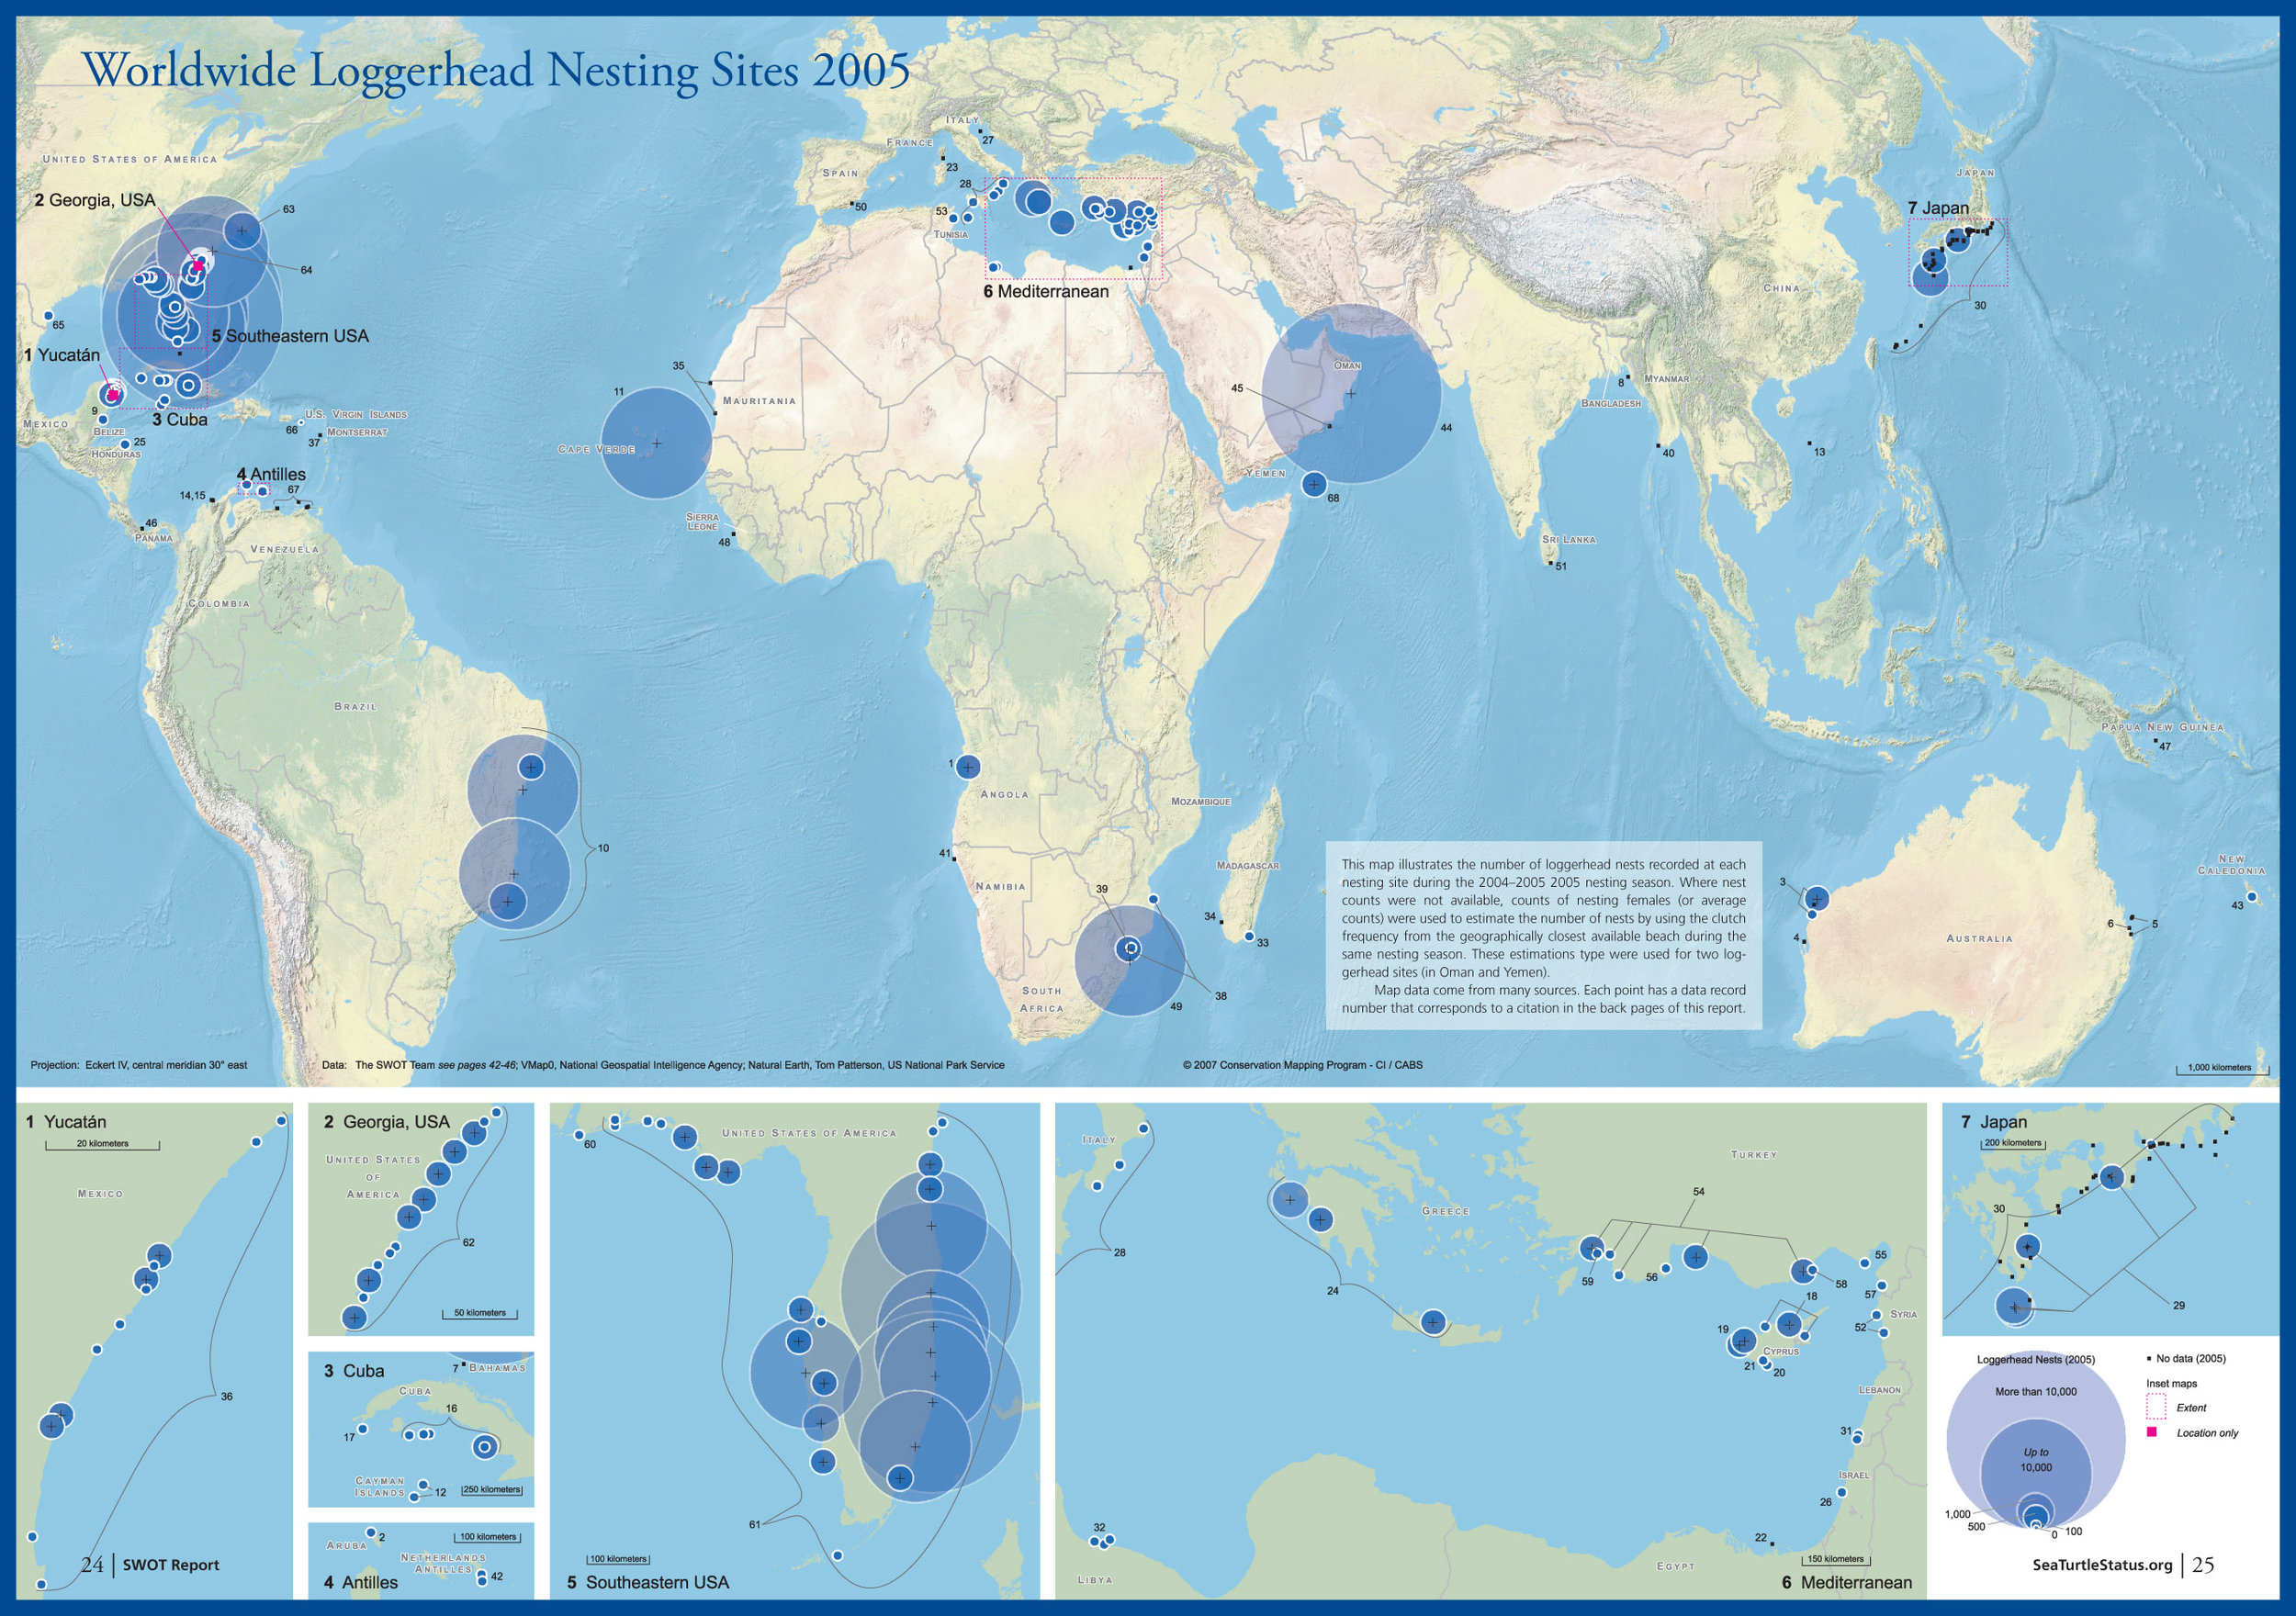 Worldwide Loggerhead Nesting Sites 2005 ( data citations ) |   SWOT Report , vol. II (2007) .